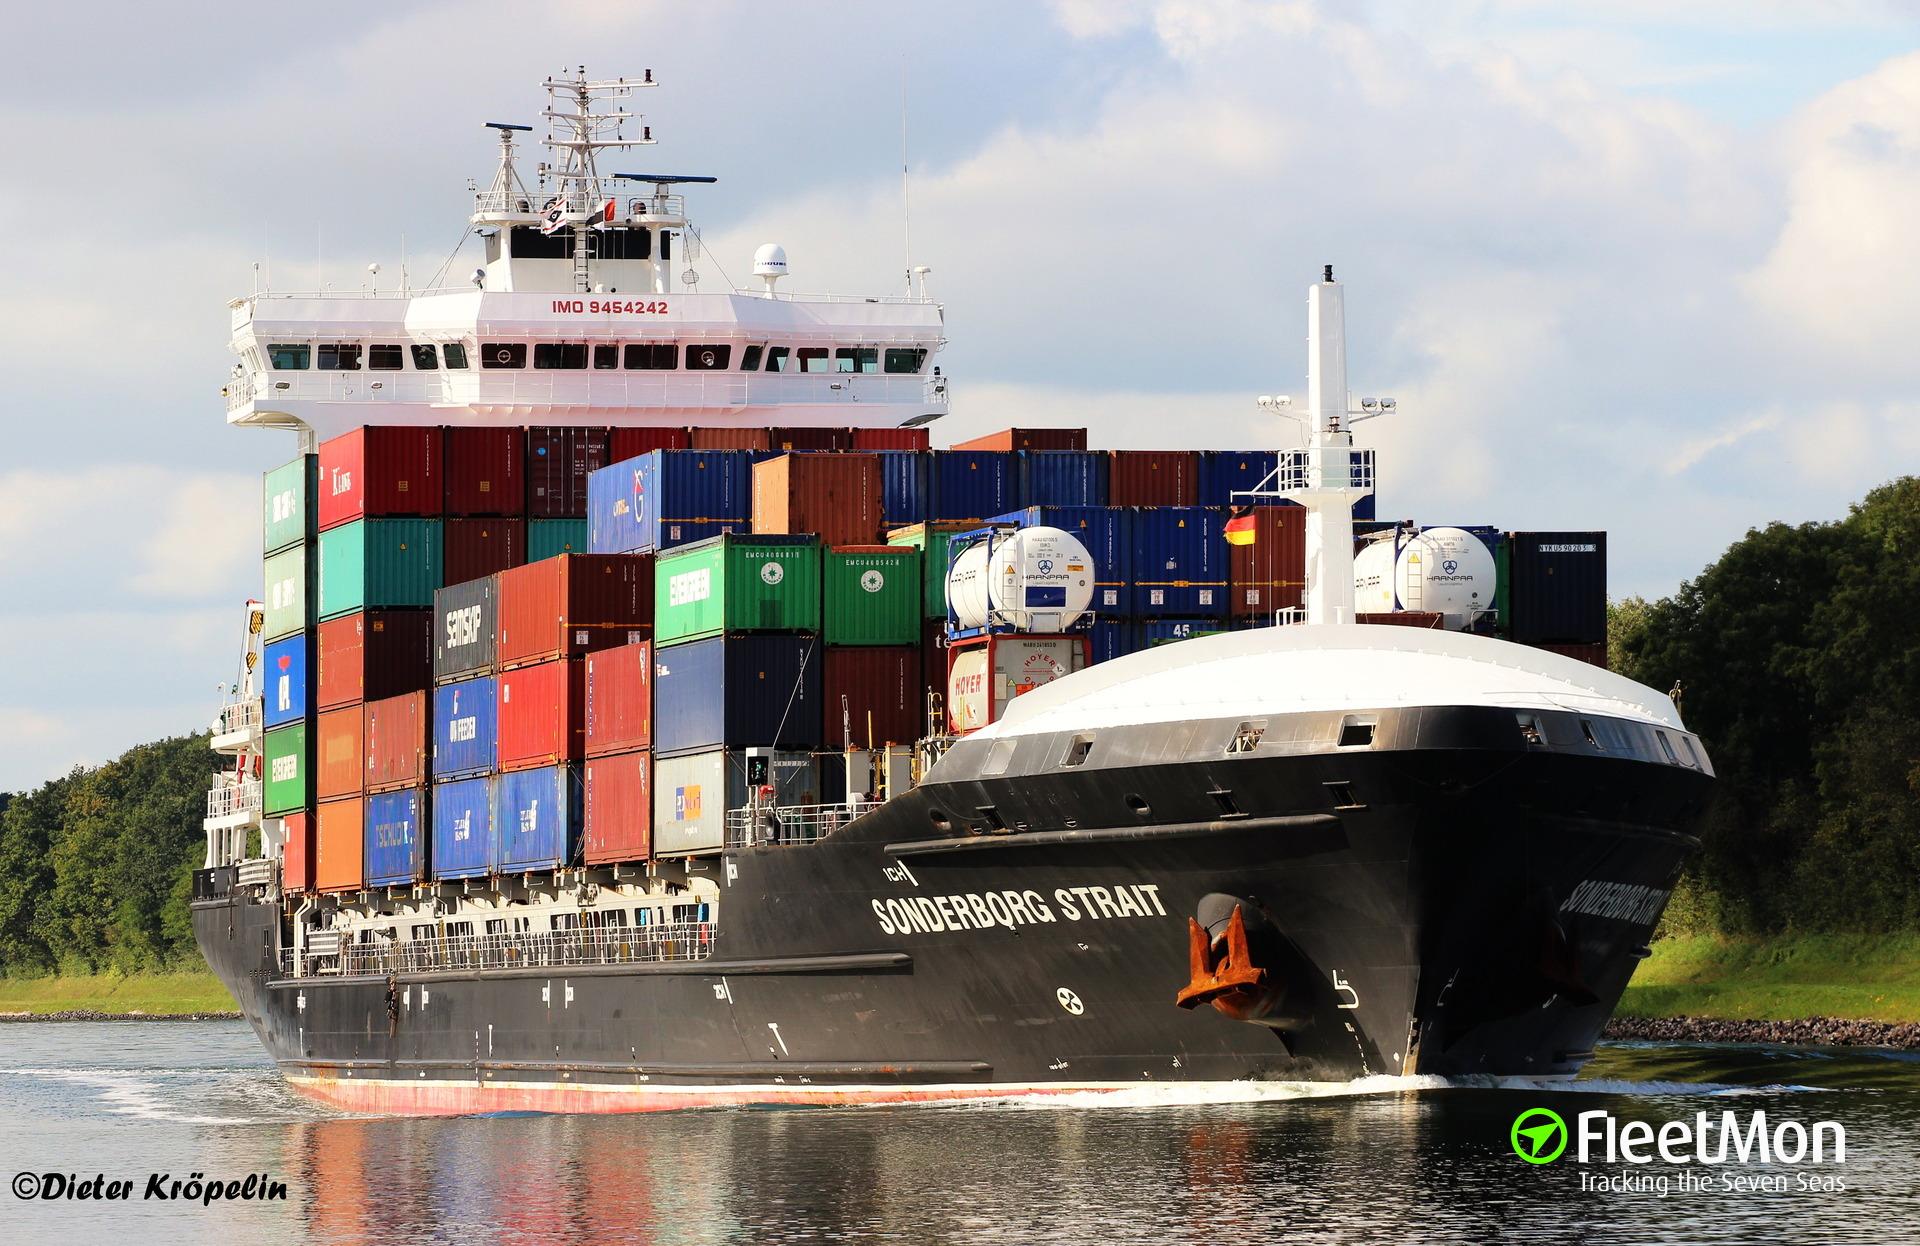 Container ship SONDERBORG STRAIT blocked Kiel Canal